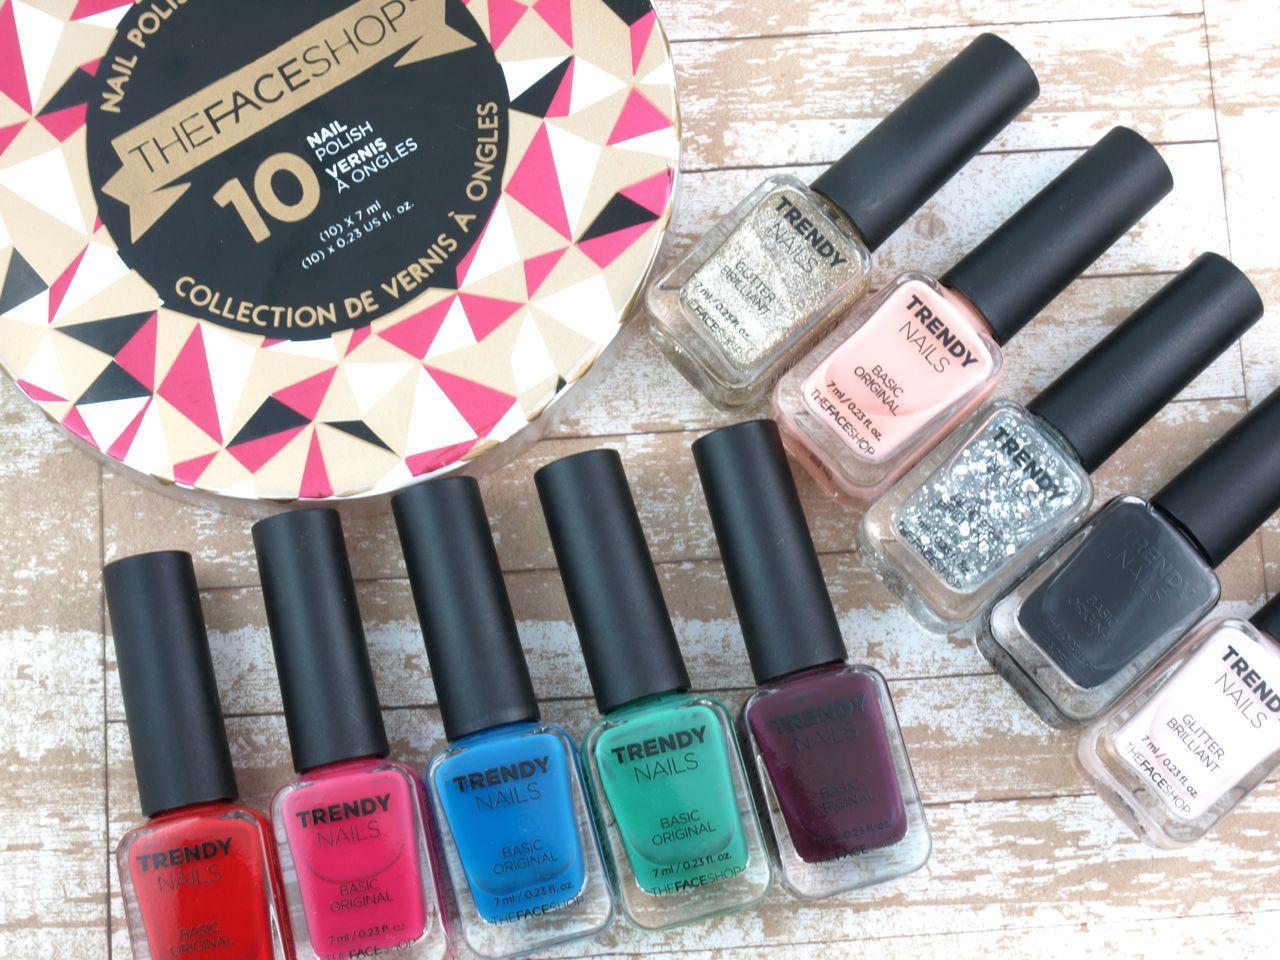 THEFACESHOP Holiday 2015 Trendy Nails Nail Polish Collection: Review ...